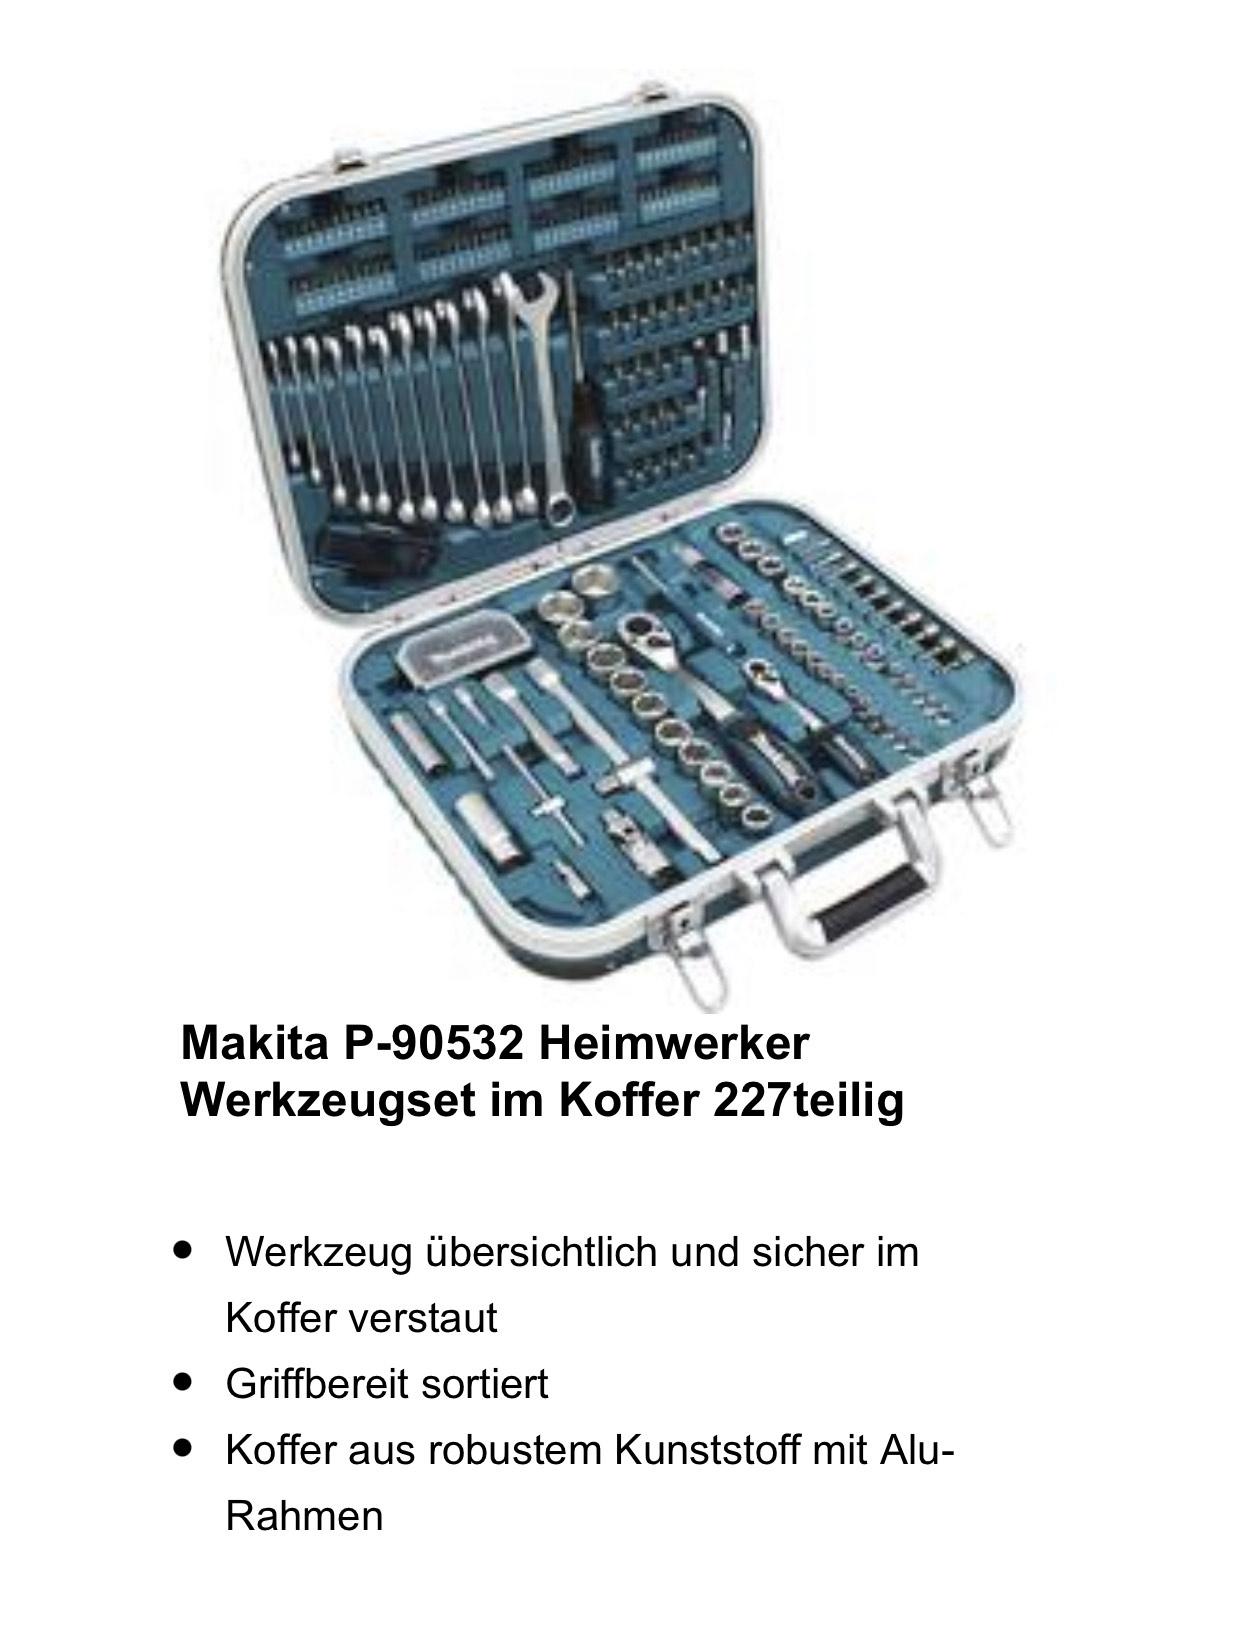 Makita P-90532 Werkzeug-Set im Koffer